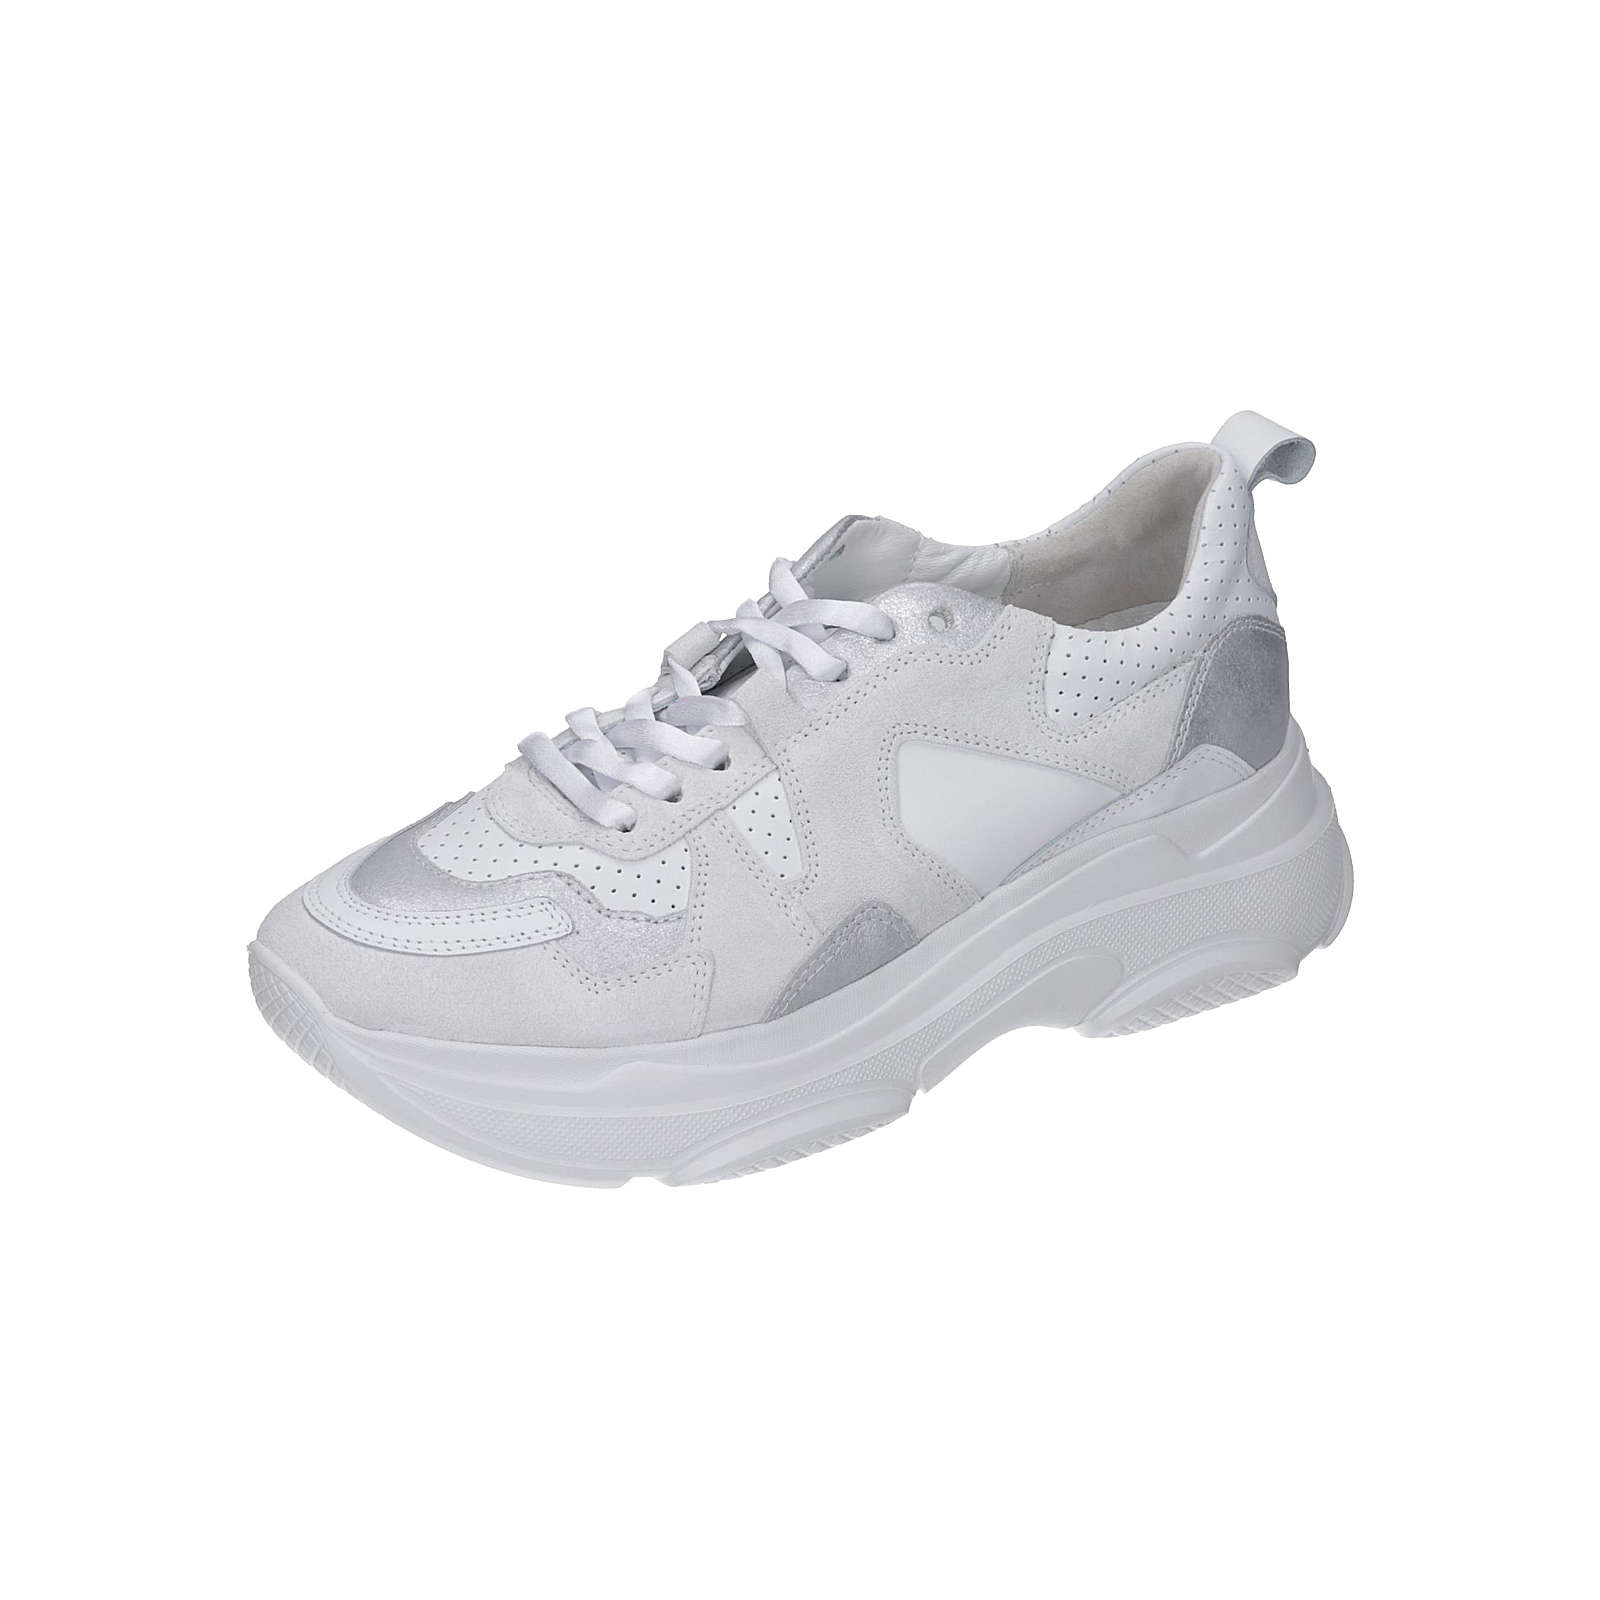 Kennel & Schmenger Damen Sneaker weiß Damen Gr. 41